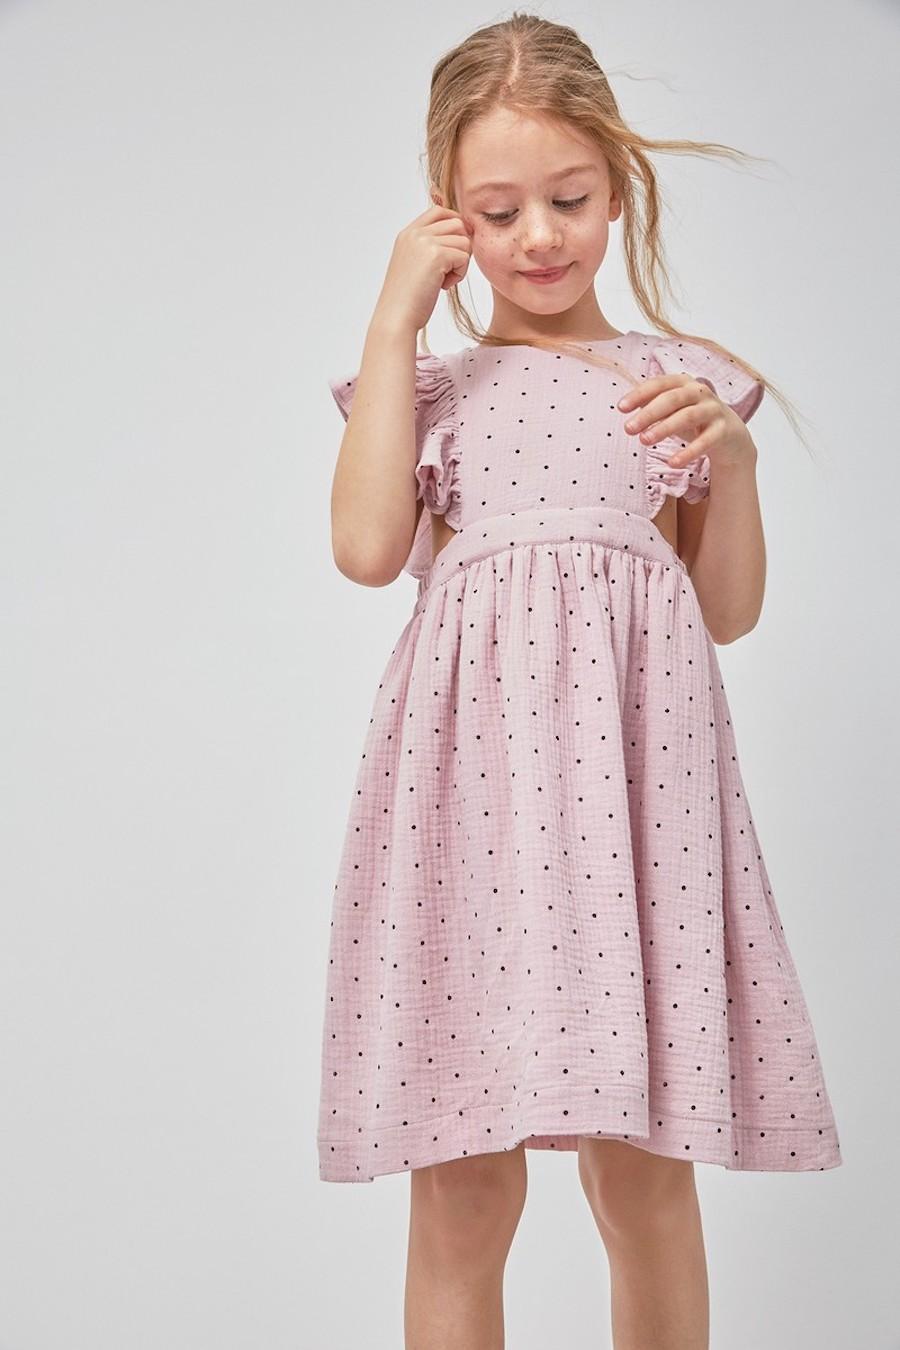 f2ca57fc2 Moodblue ropa infantil